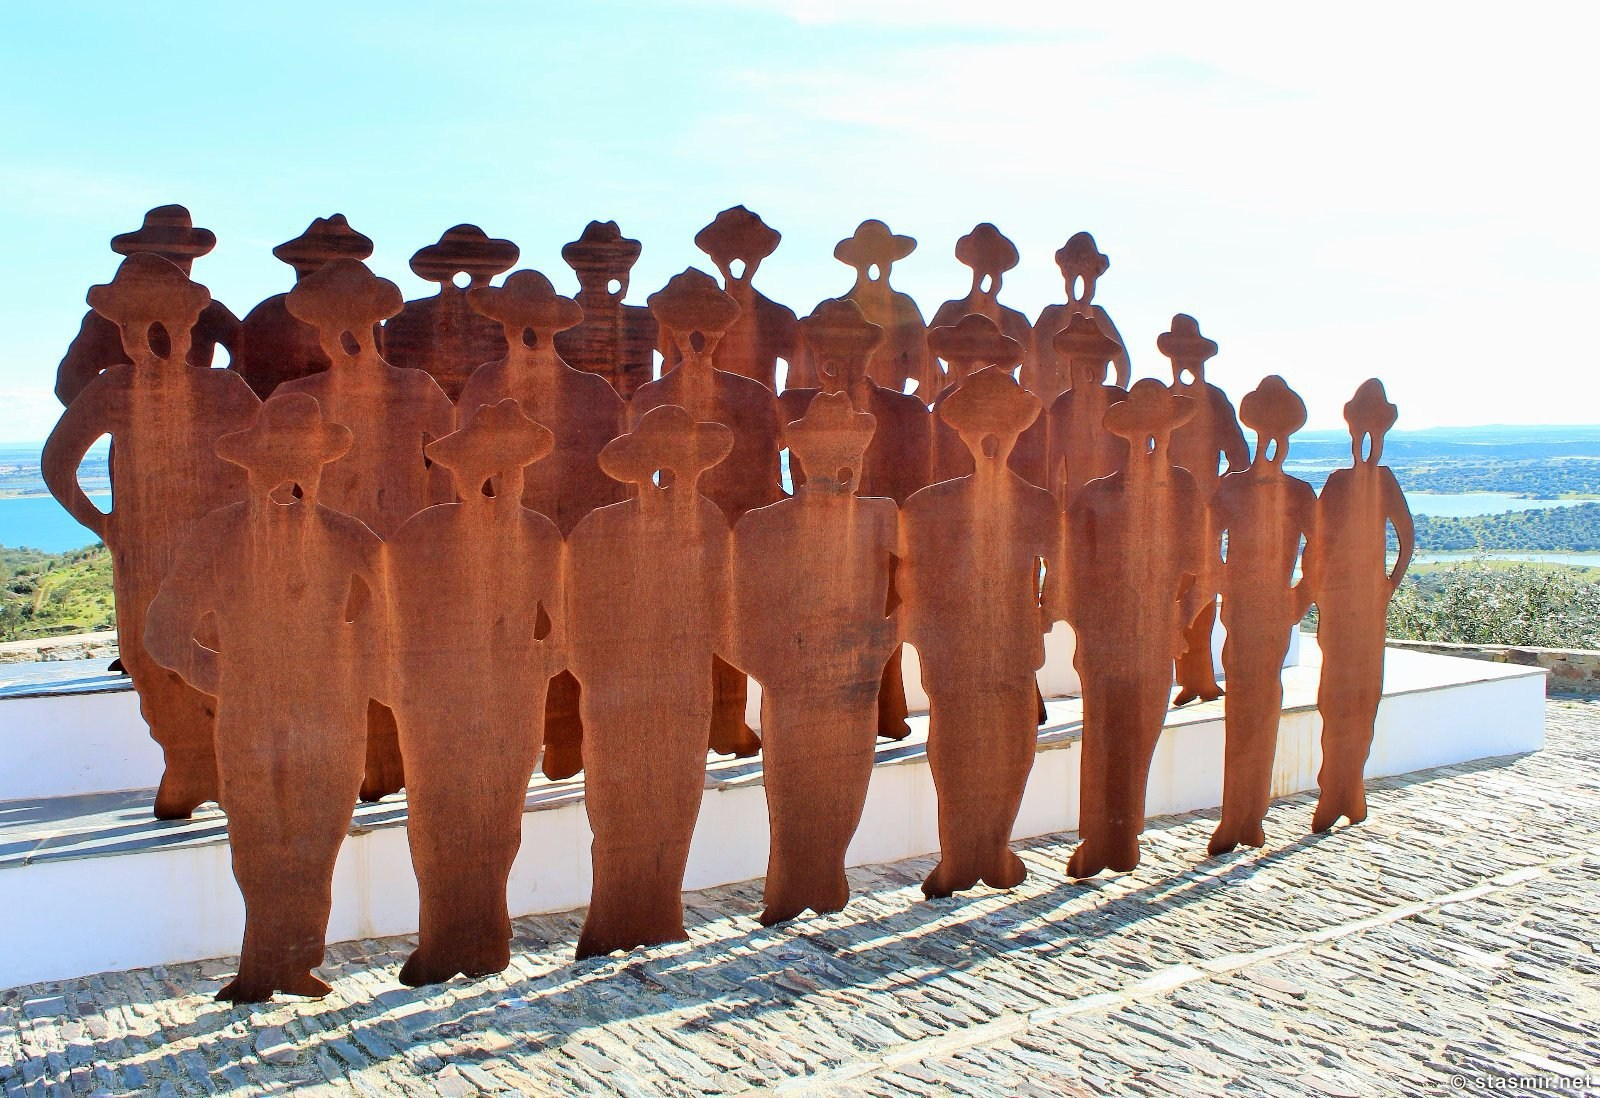 памятник алентежским певцам, Монсараж, Алентежу, Португалия, Cante Alentejano, Monsaraz, photo Stasmir, фото Стасмир